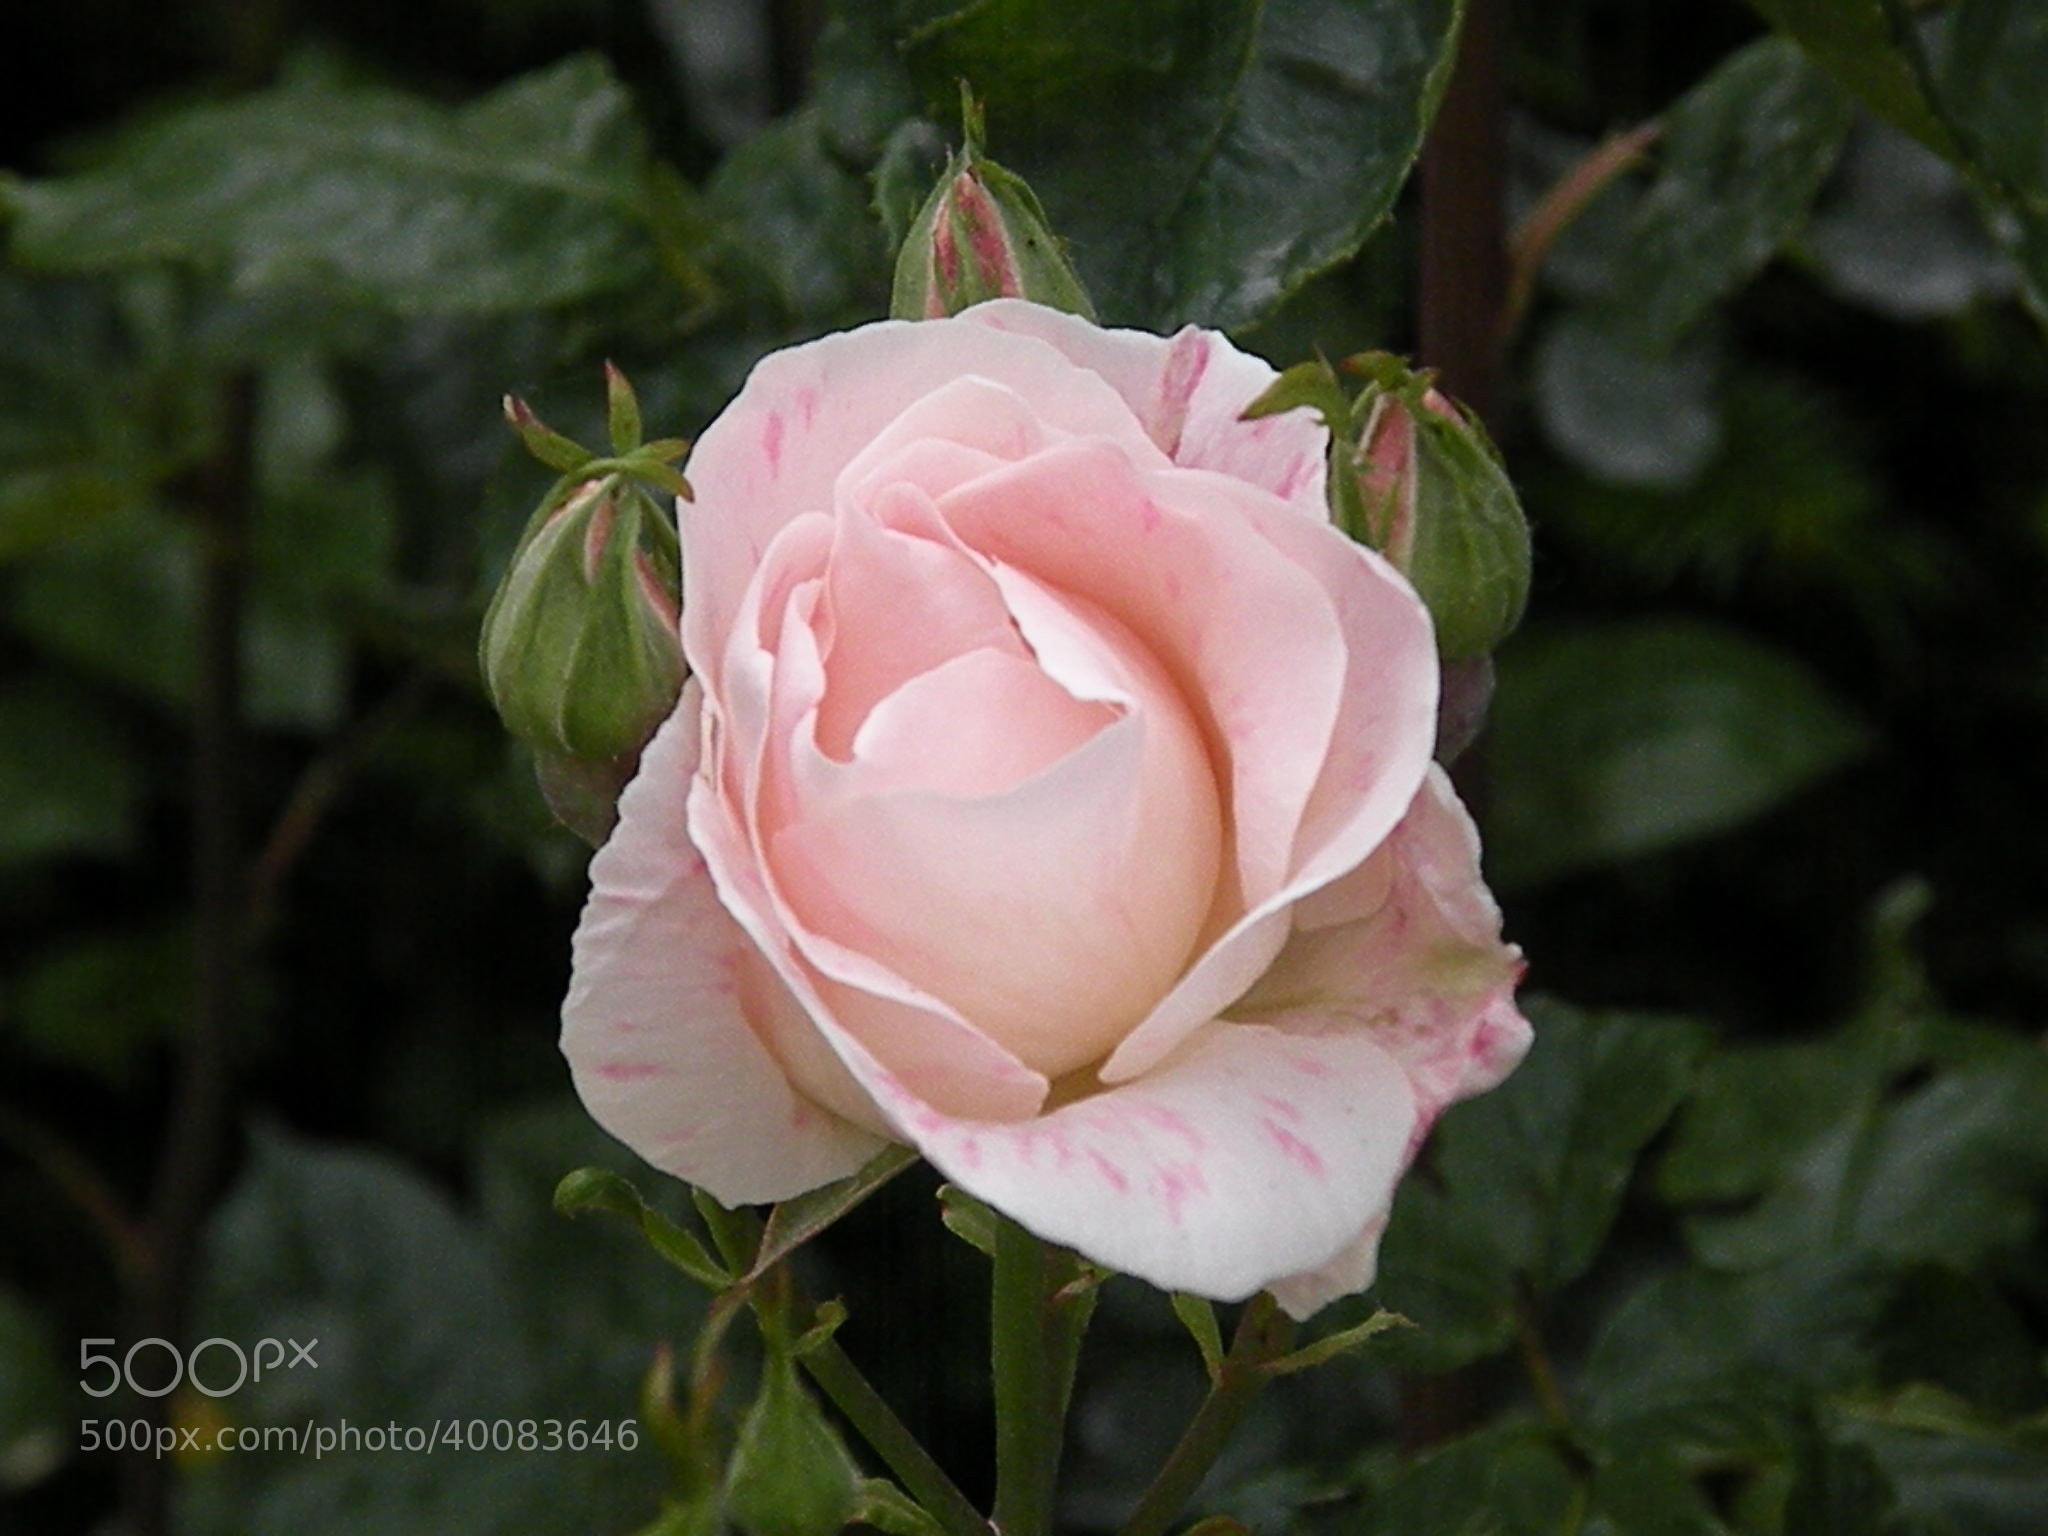 Photograph Rosa rosa by Jose Maria Vidal Sanz on 500px